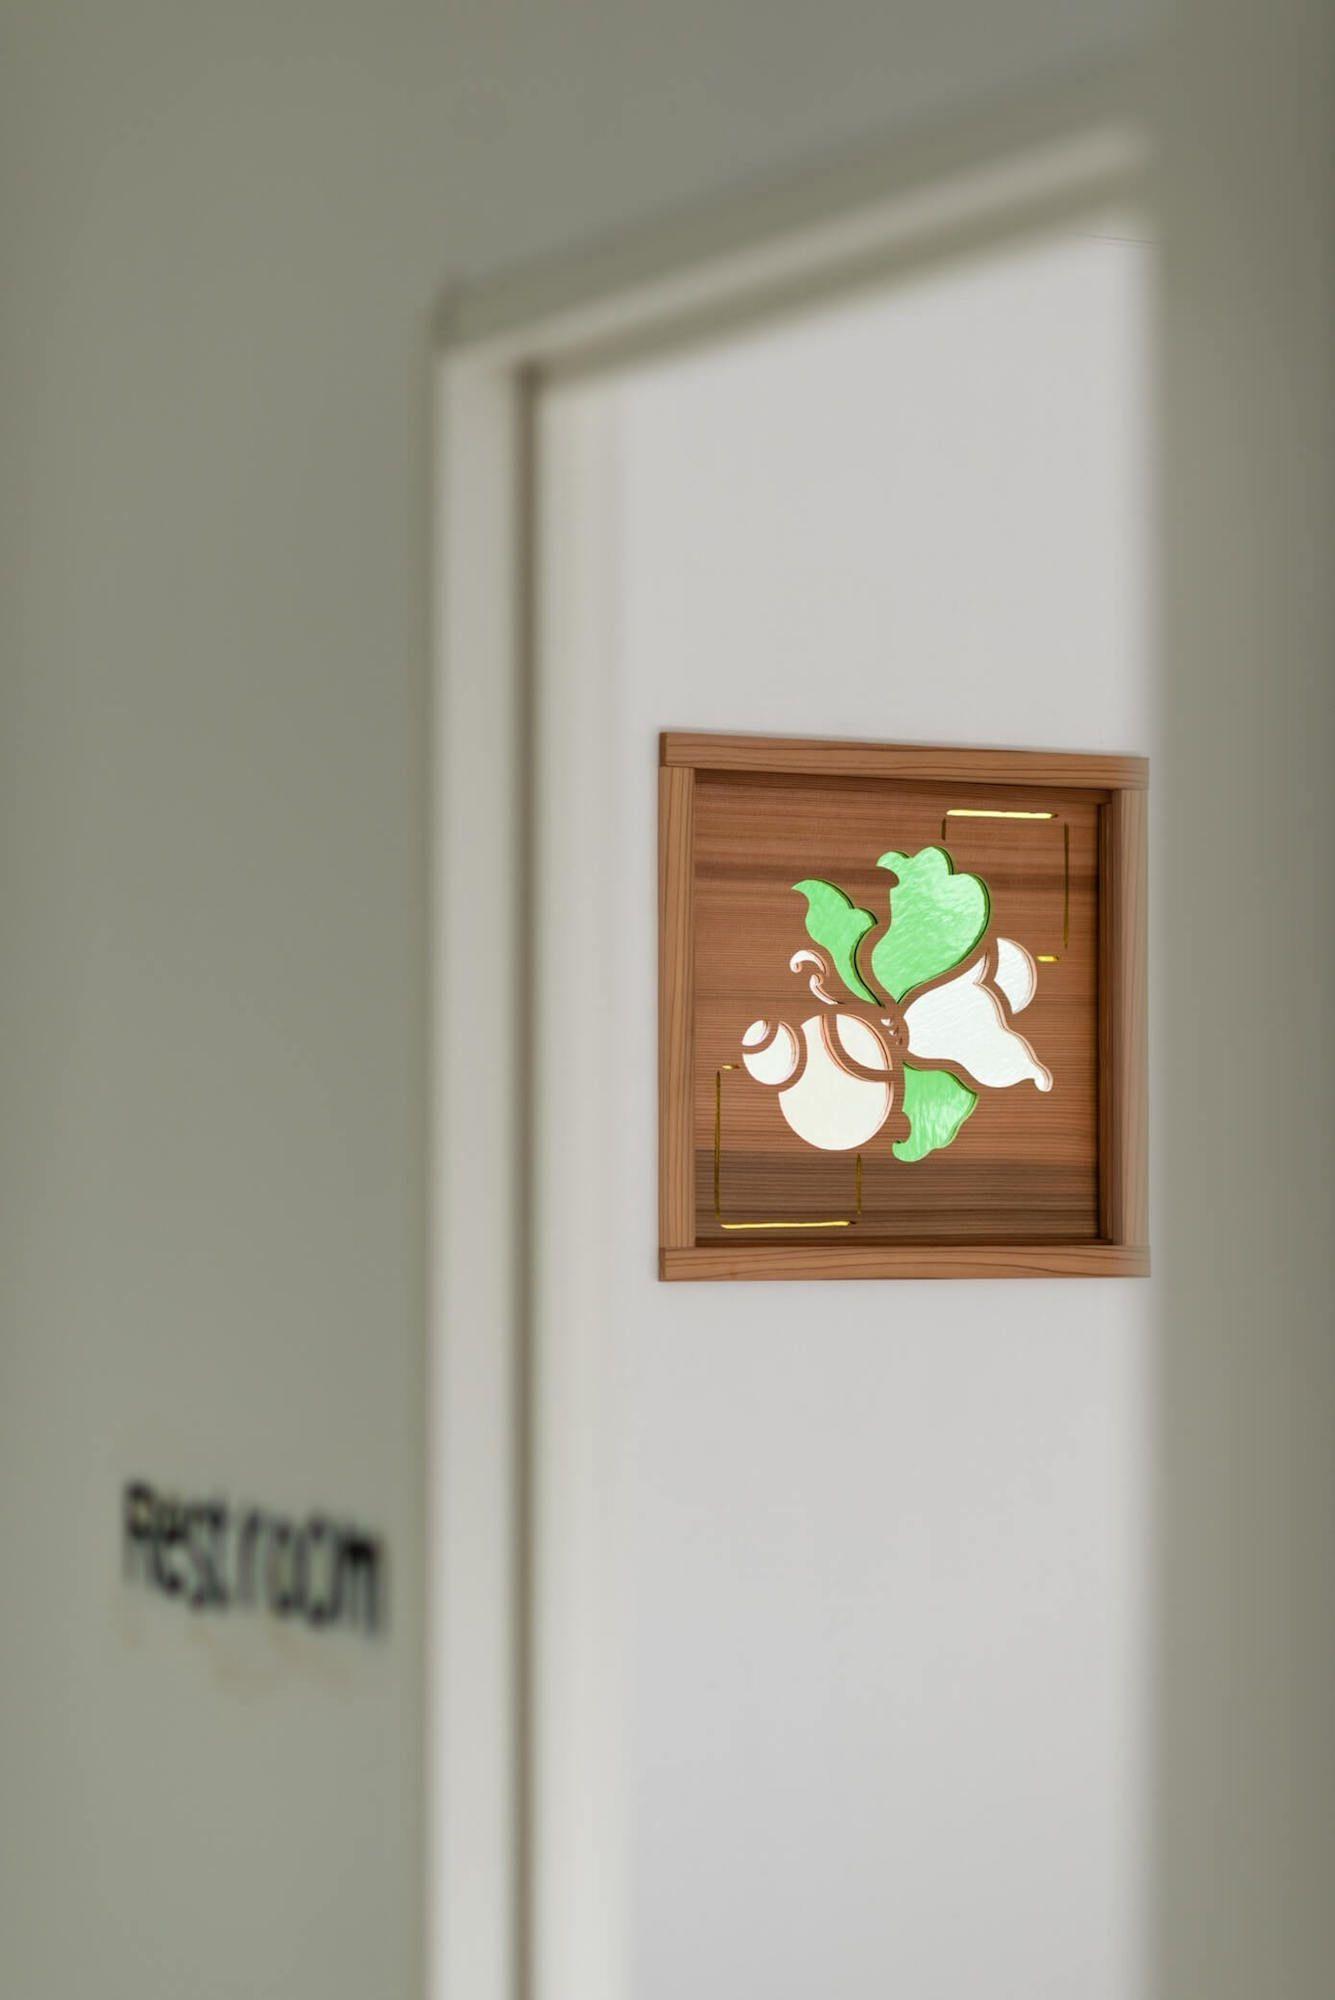 satoduto-coil-kazuteru-matumura-architects-11